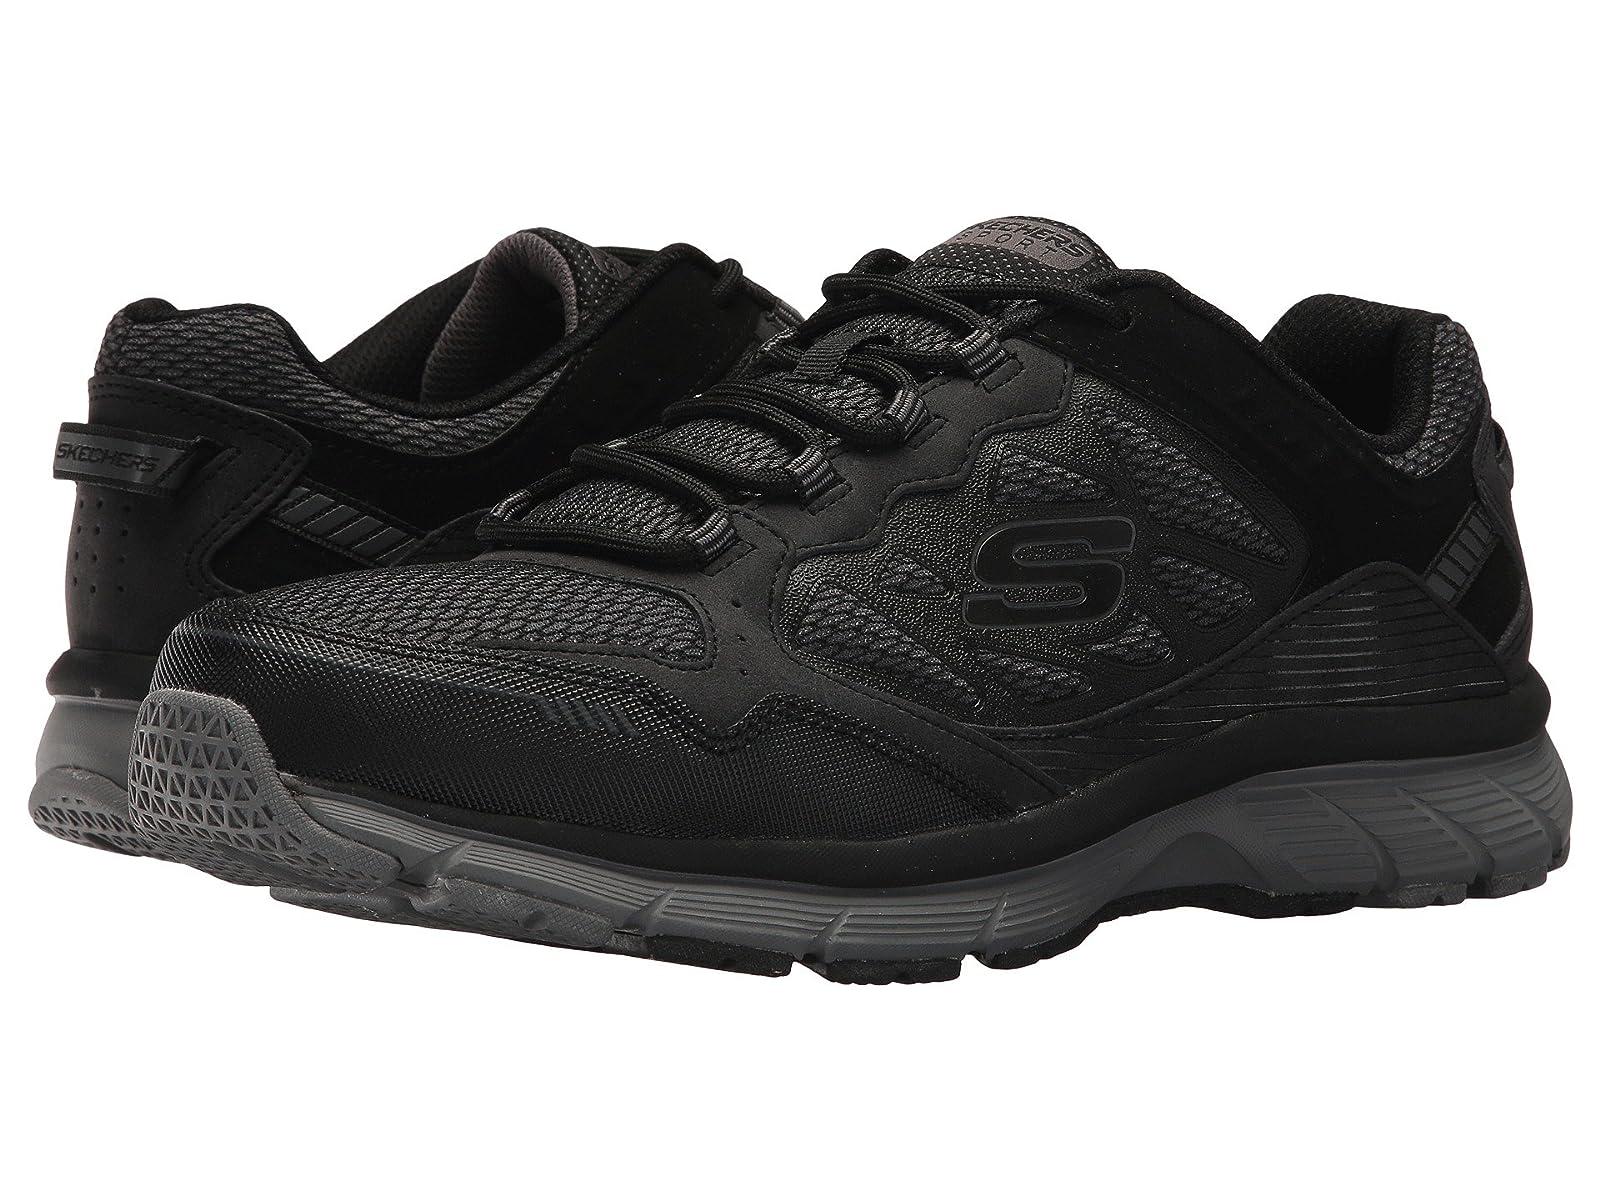 SKECHERS BowerzAtmospheric grades have affordable shoes